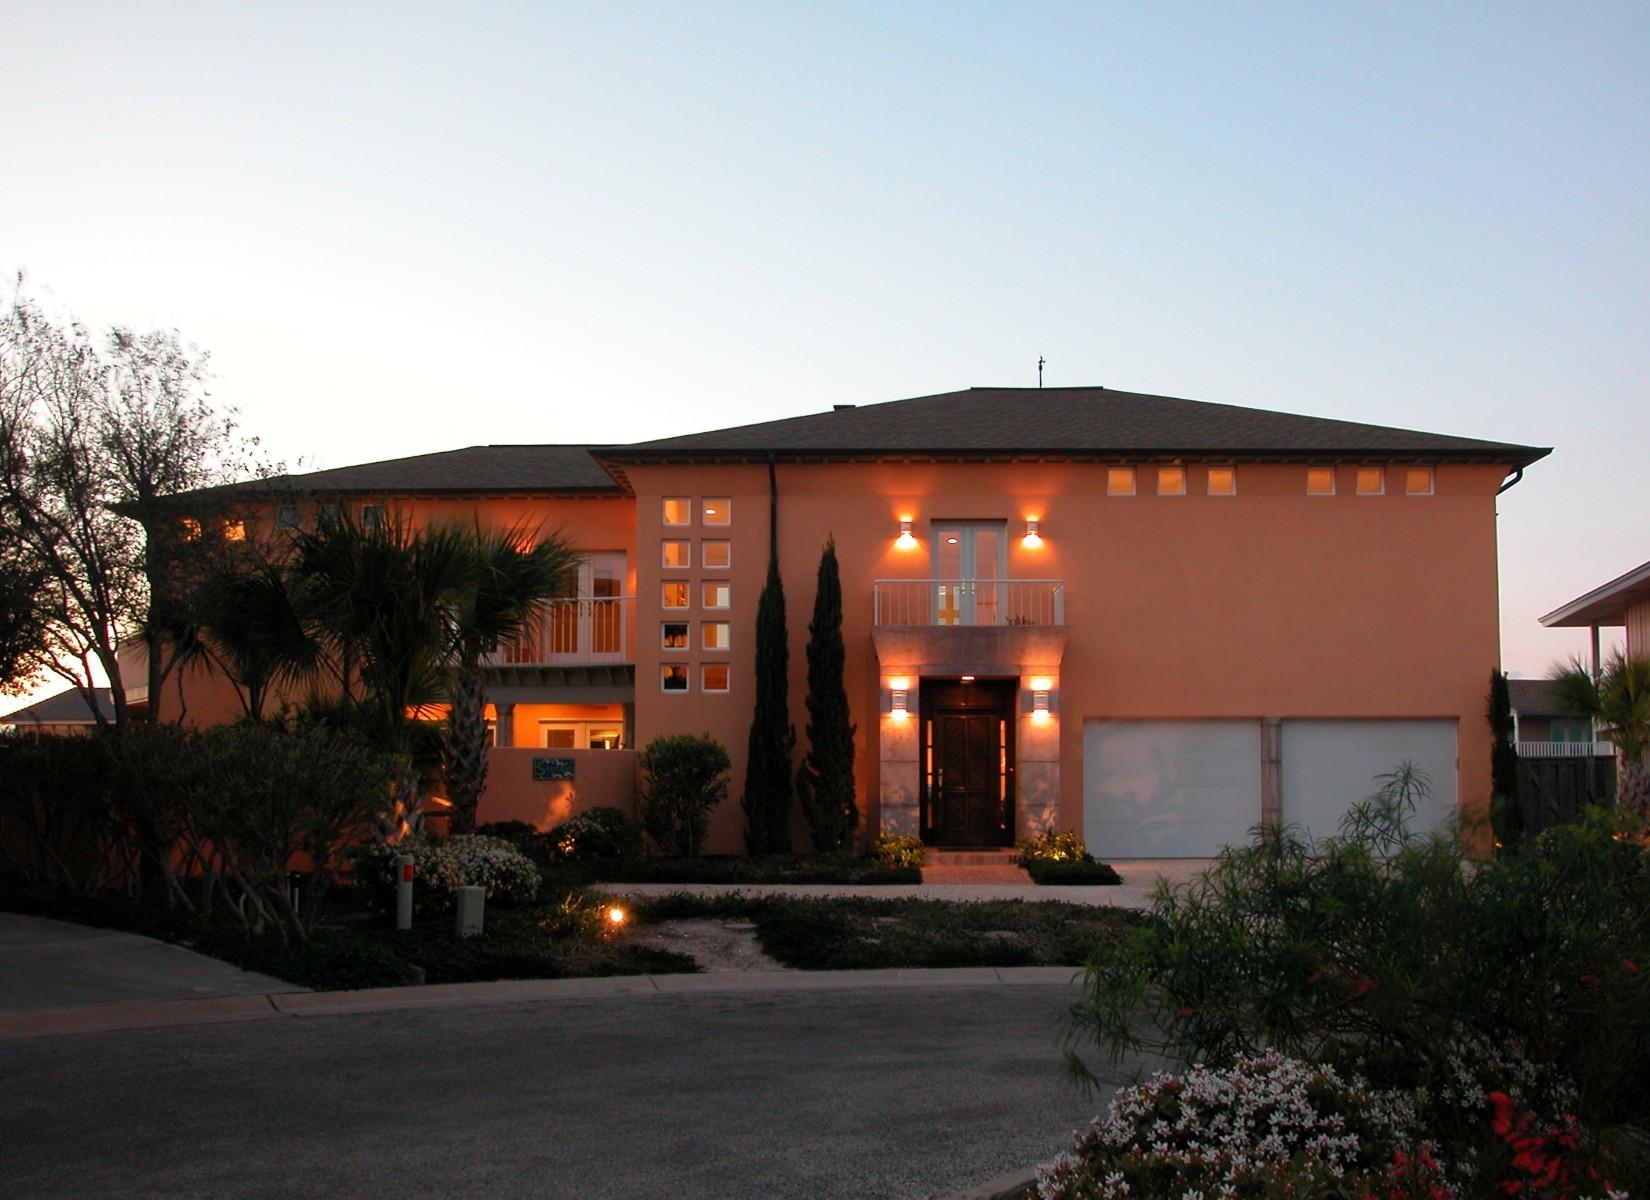 sullivan house front elevation.jpg